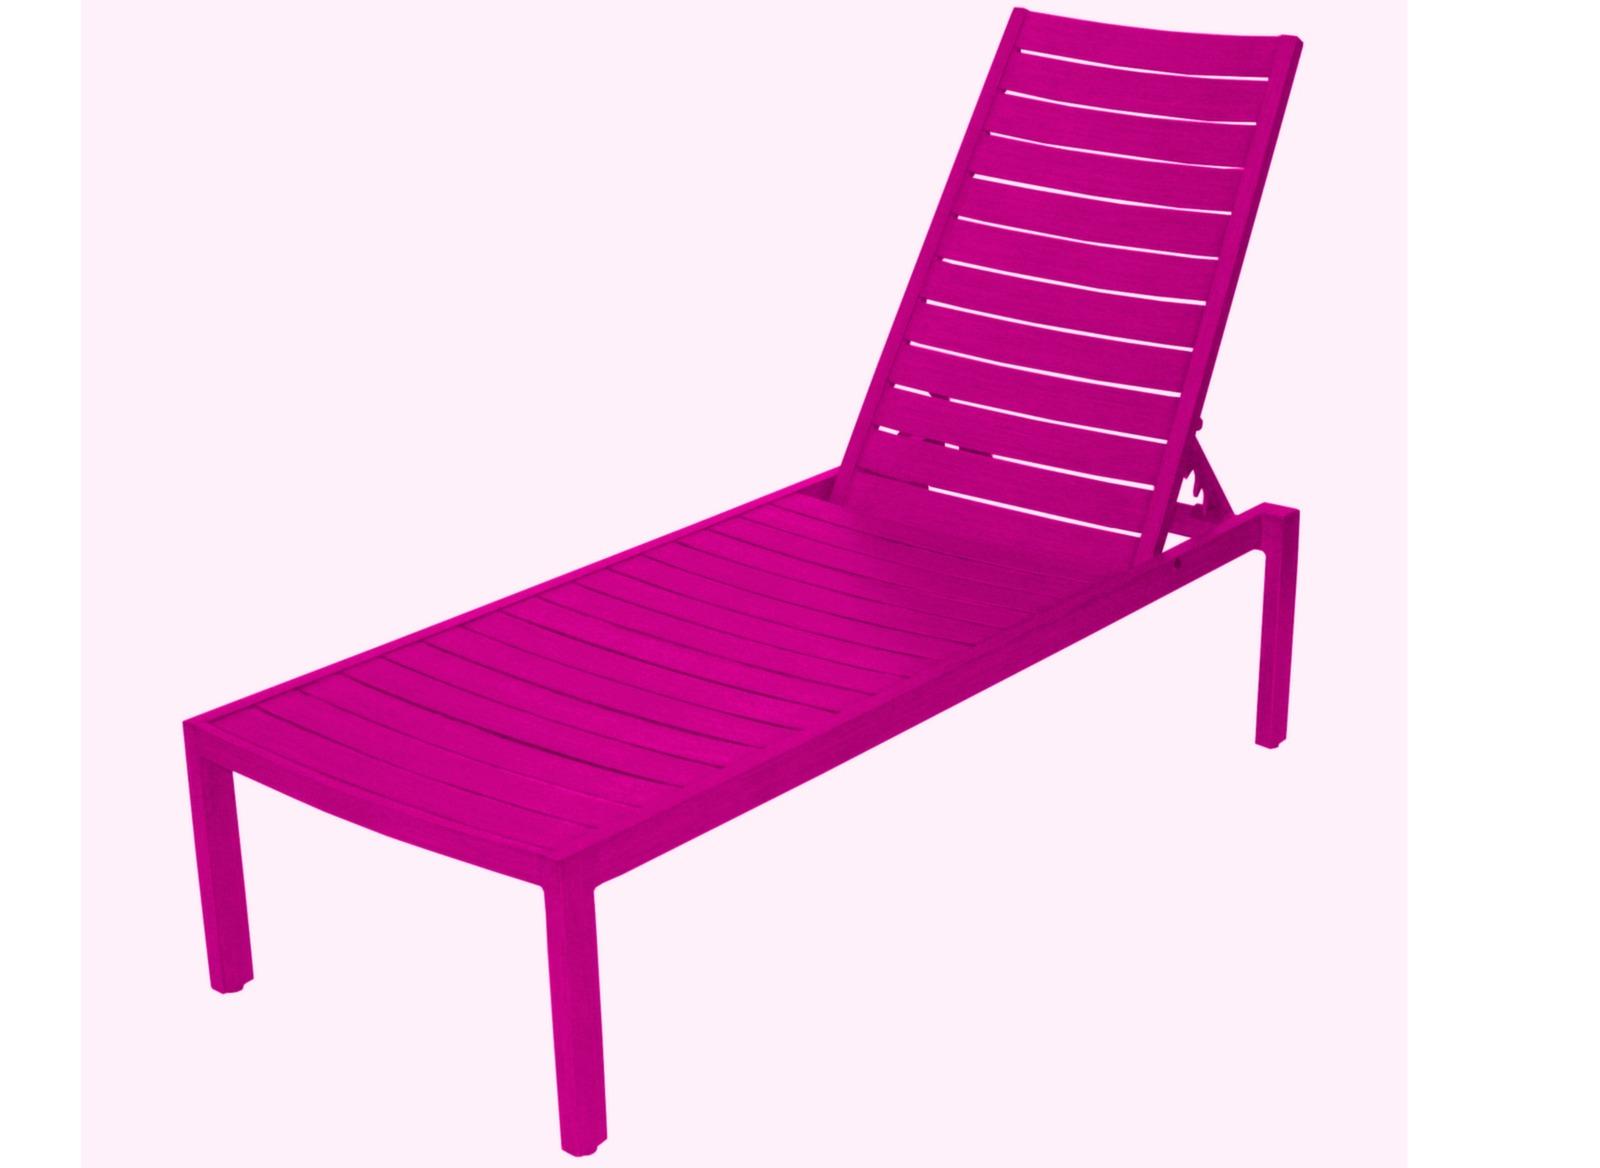 bain de soleil promotion latin oc o mobilier de jardin proloisirs. Black Bedroom Furniture Sets. Home Design Ideas